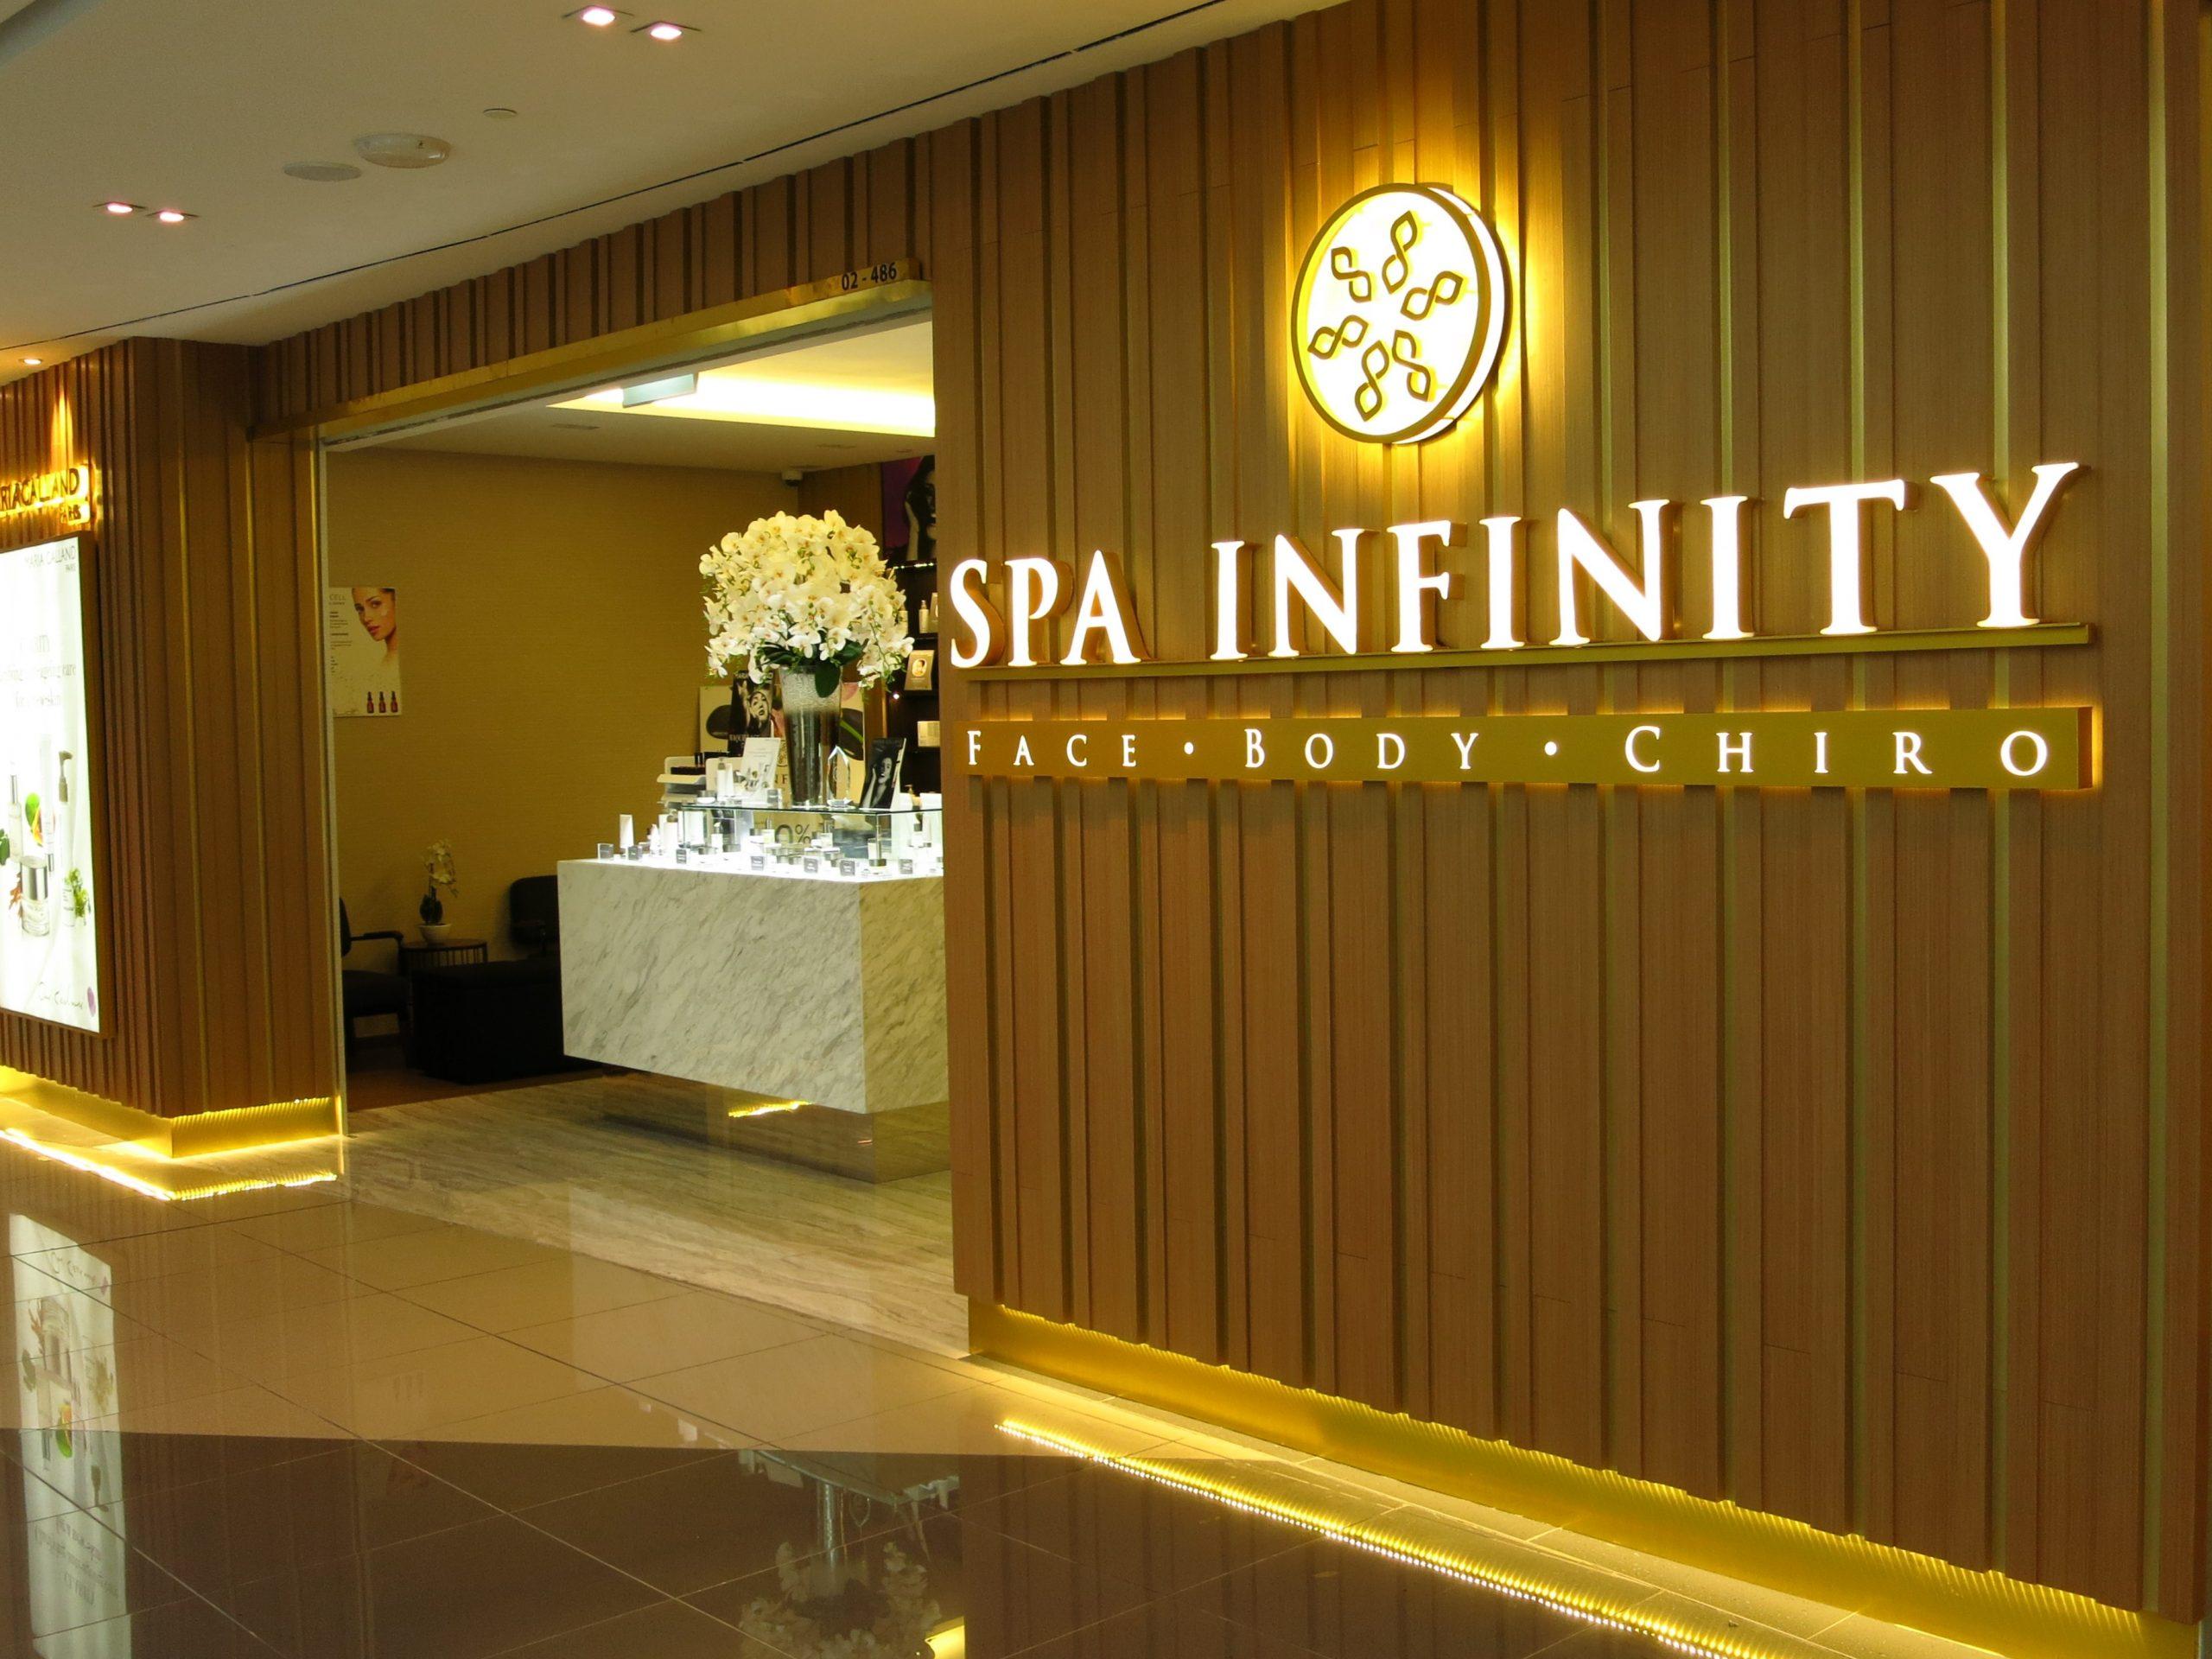 Spa Infinity